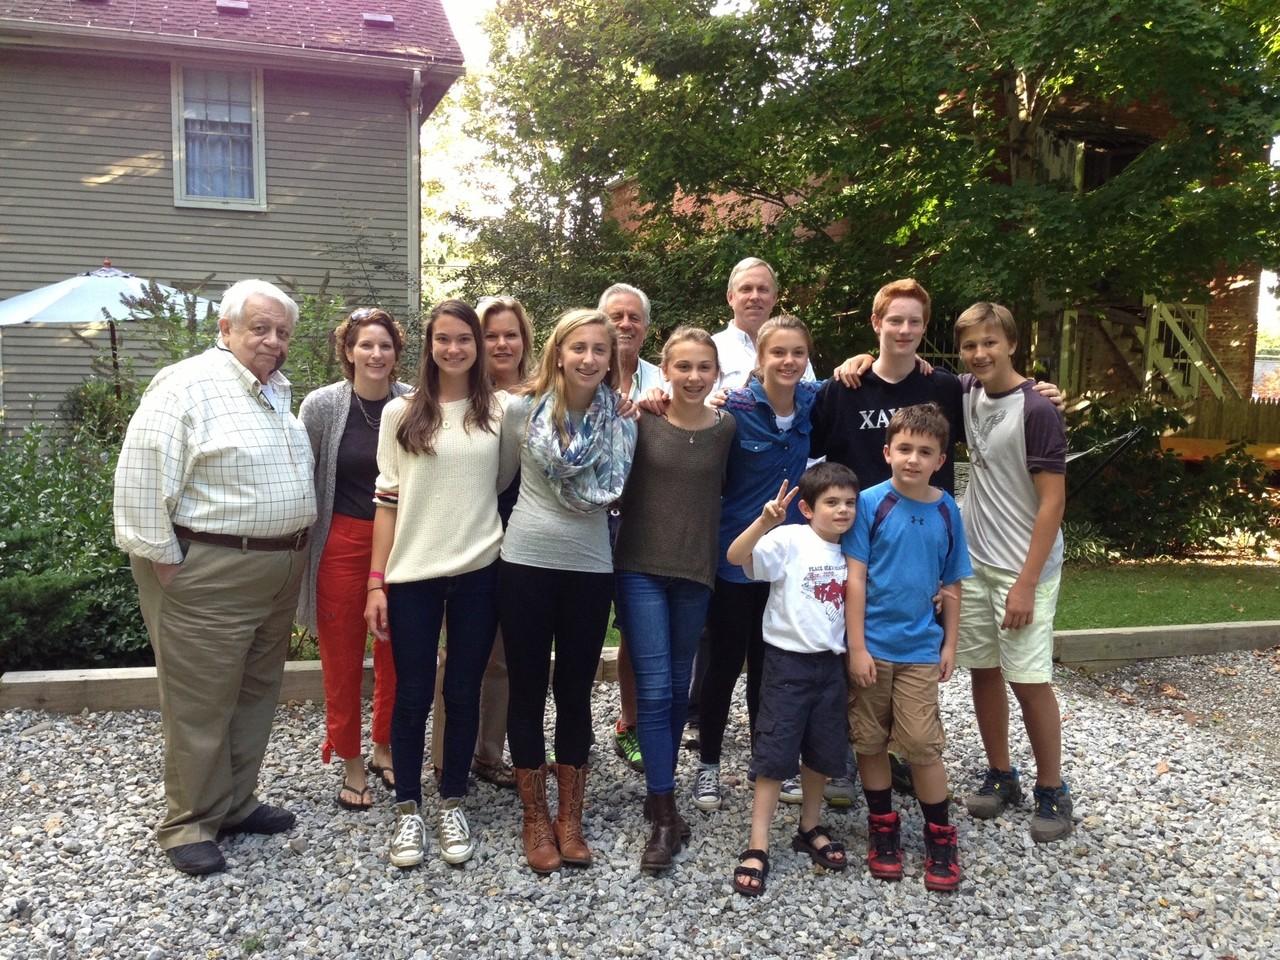 Colin, Lisa, Ellie, Celeste, Emma, Stuart Sr., Gabby, Stuart Jr., Kate, Sam, Noah, Stuey III, & Jack Kagel  Sept 2013 Connecticut